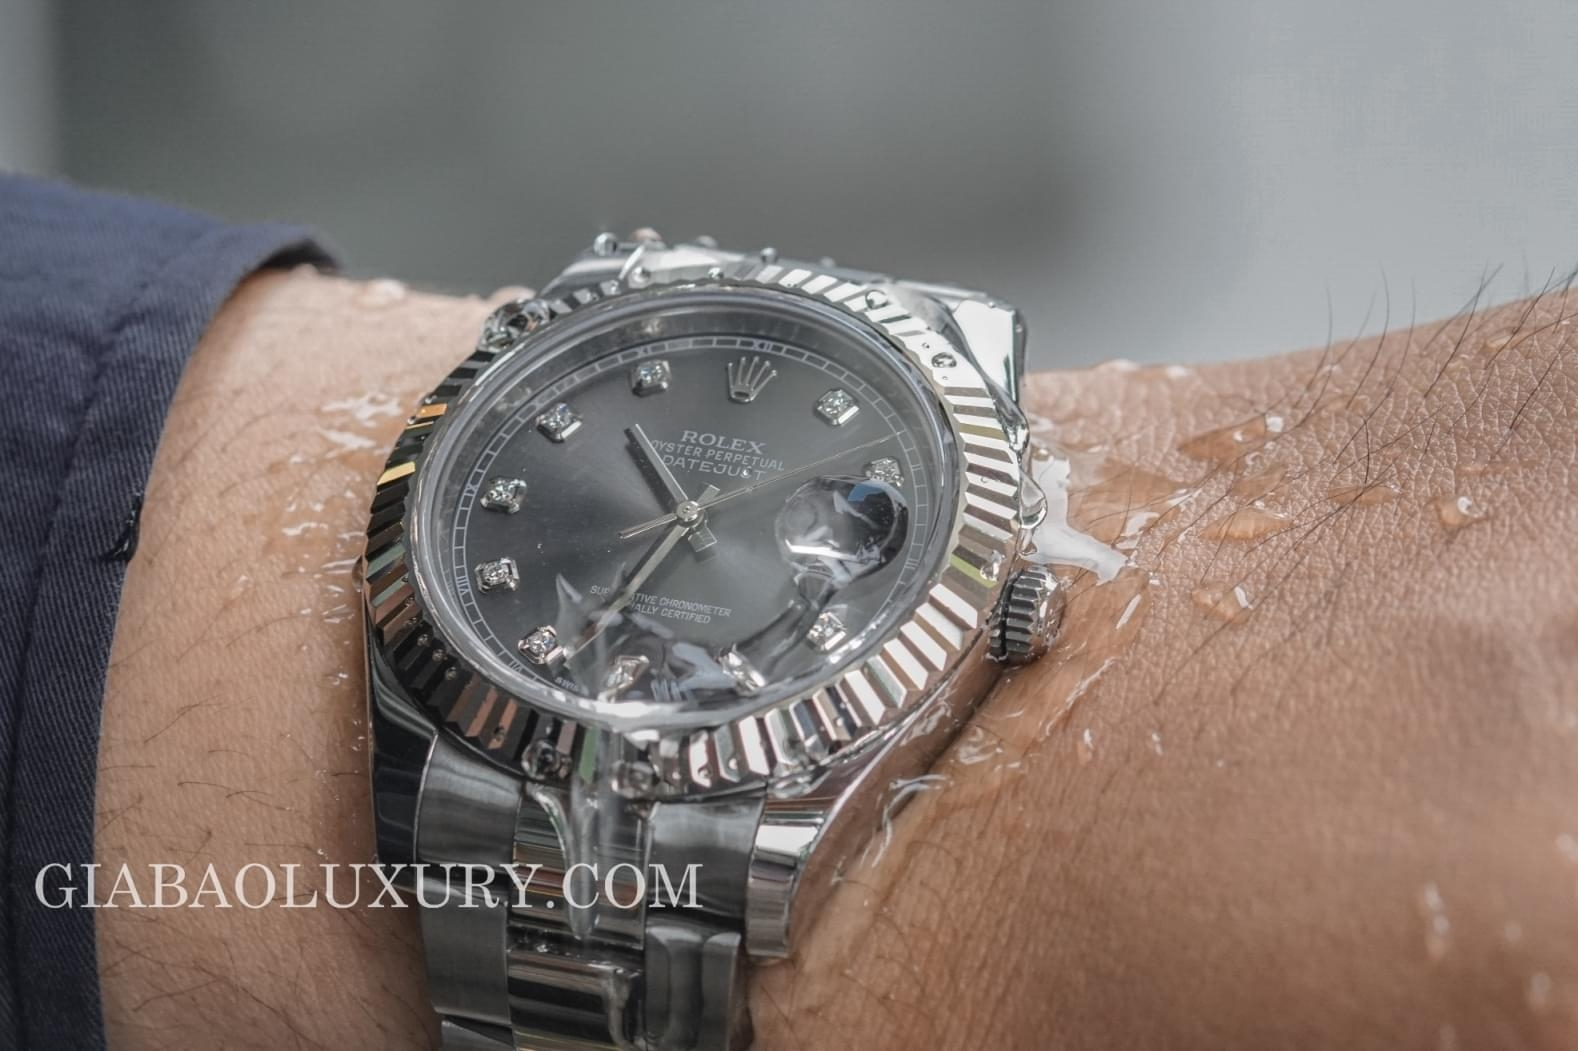 đồng hồ rolex date just 126334